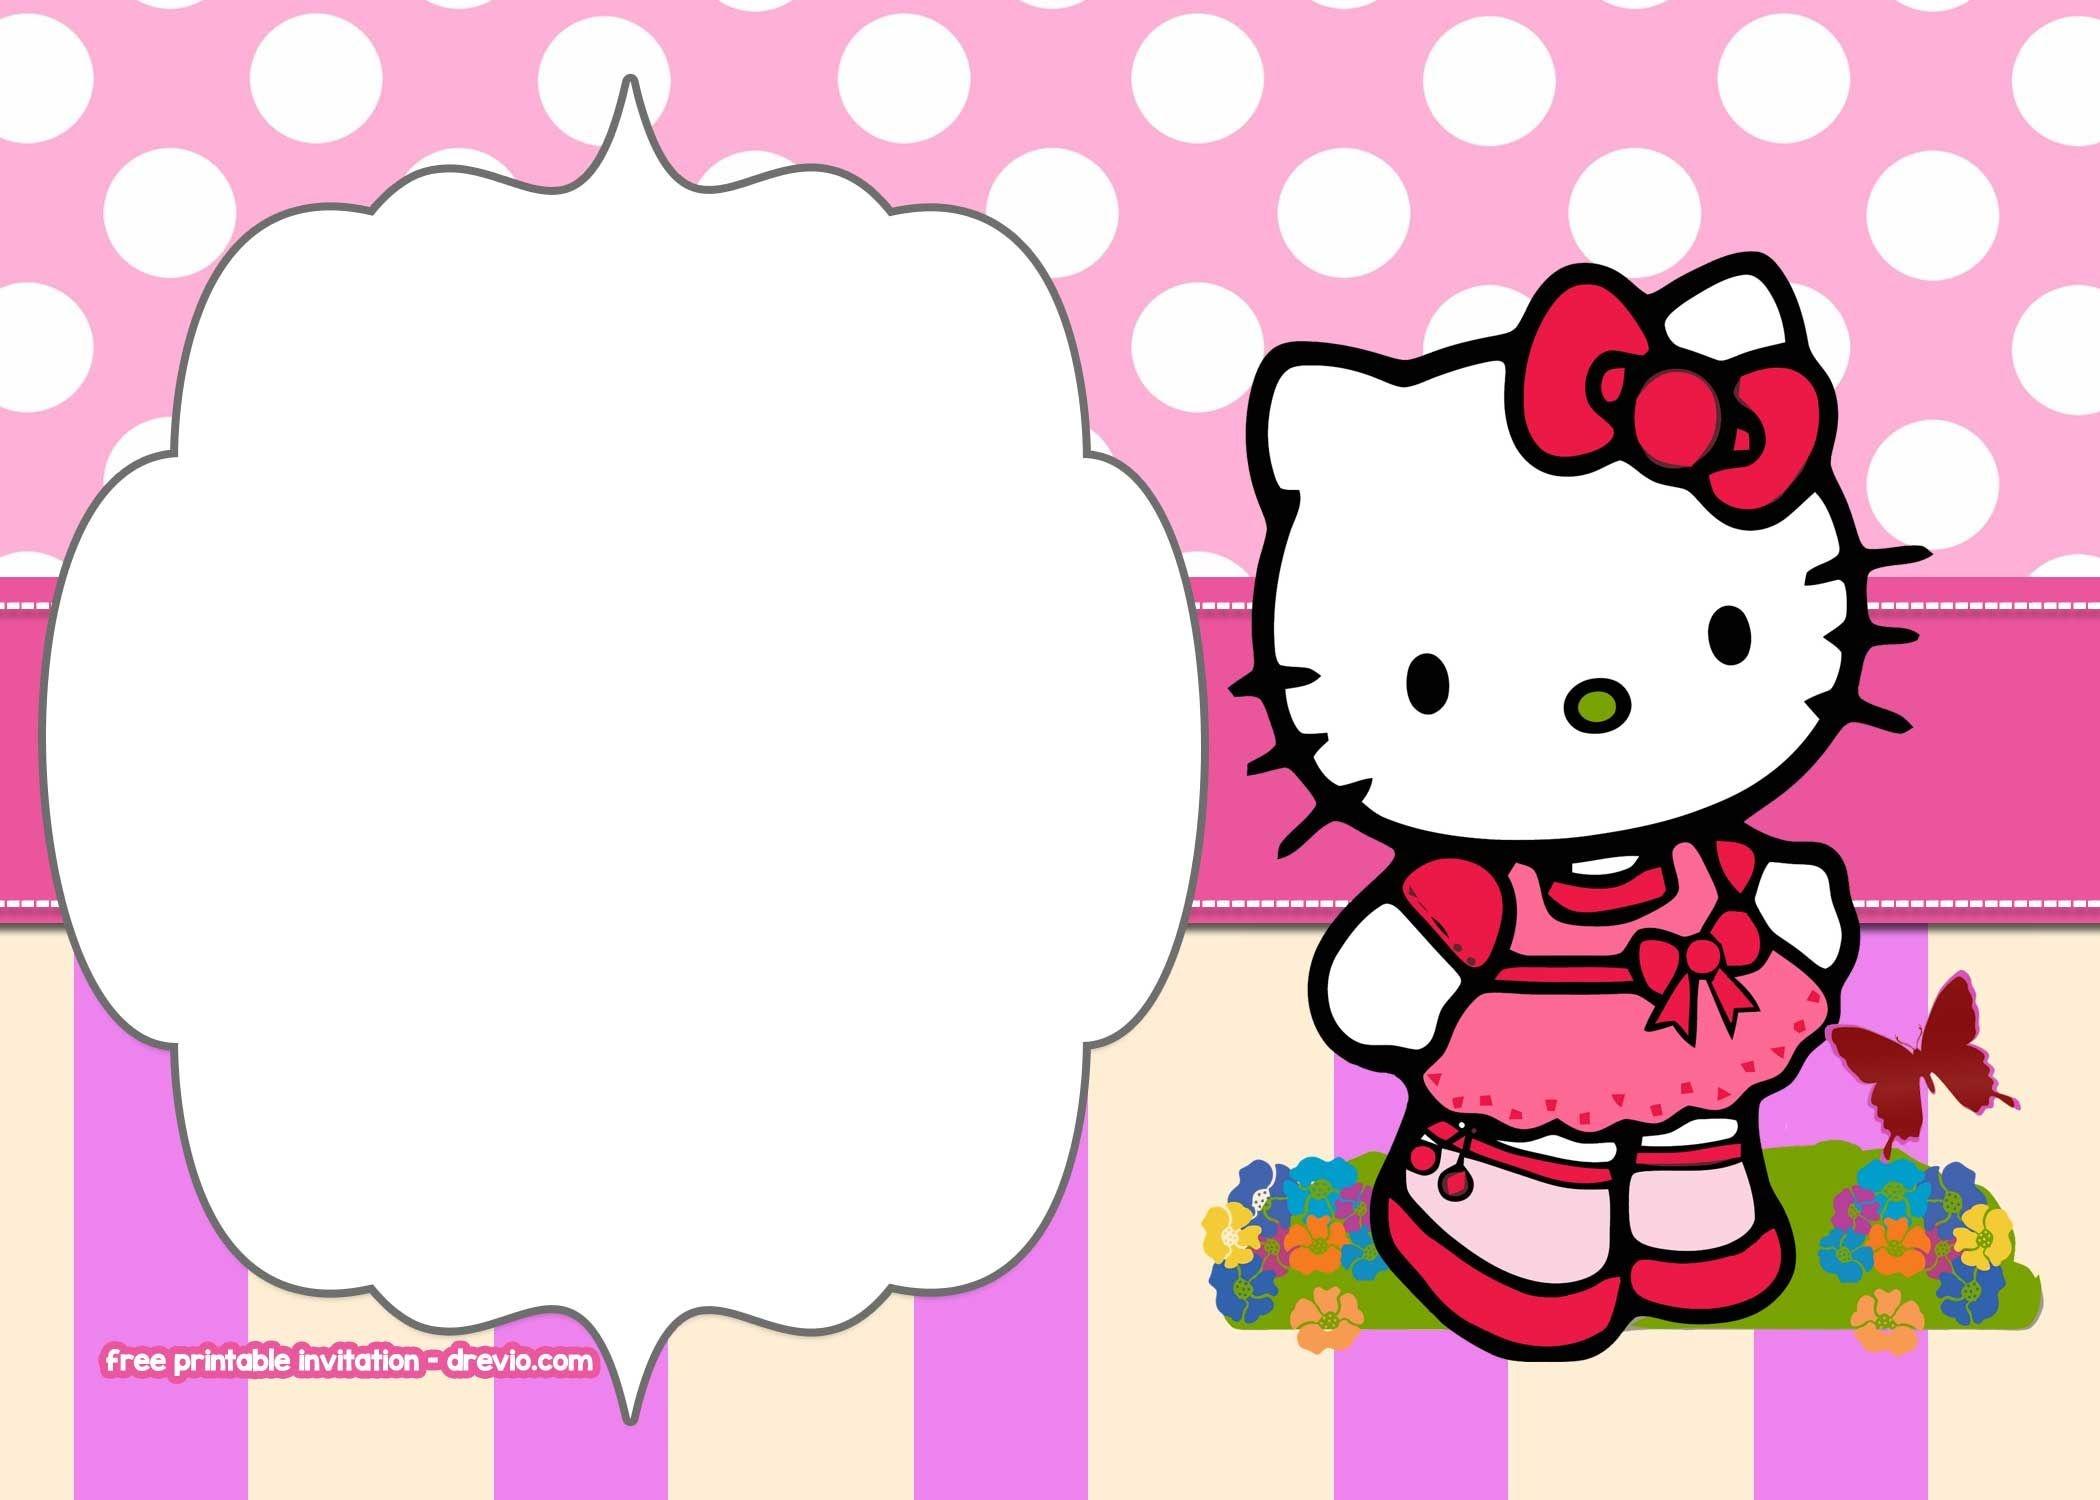 Free Printable Hello Kitty Pink Polka Dot Invitation Templates - Free Printable Polka Dot Birthday Party Invitations